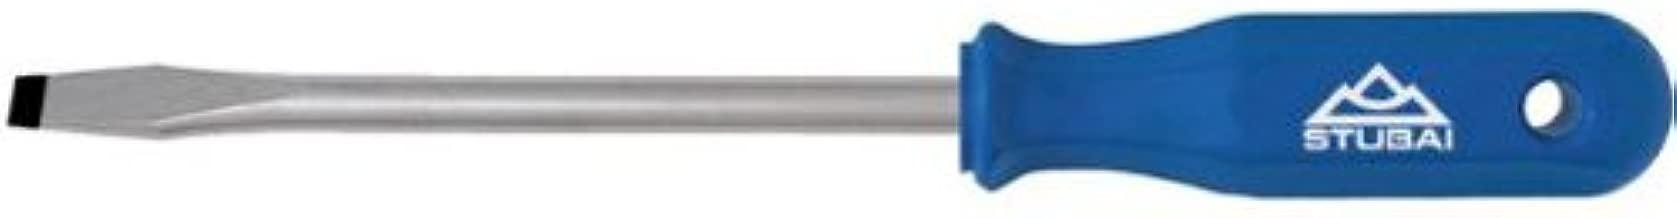 Silver//Transparent//Red Stubai 171026 Phillips Ph2 Stubby Screwdriver 6//25 mm